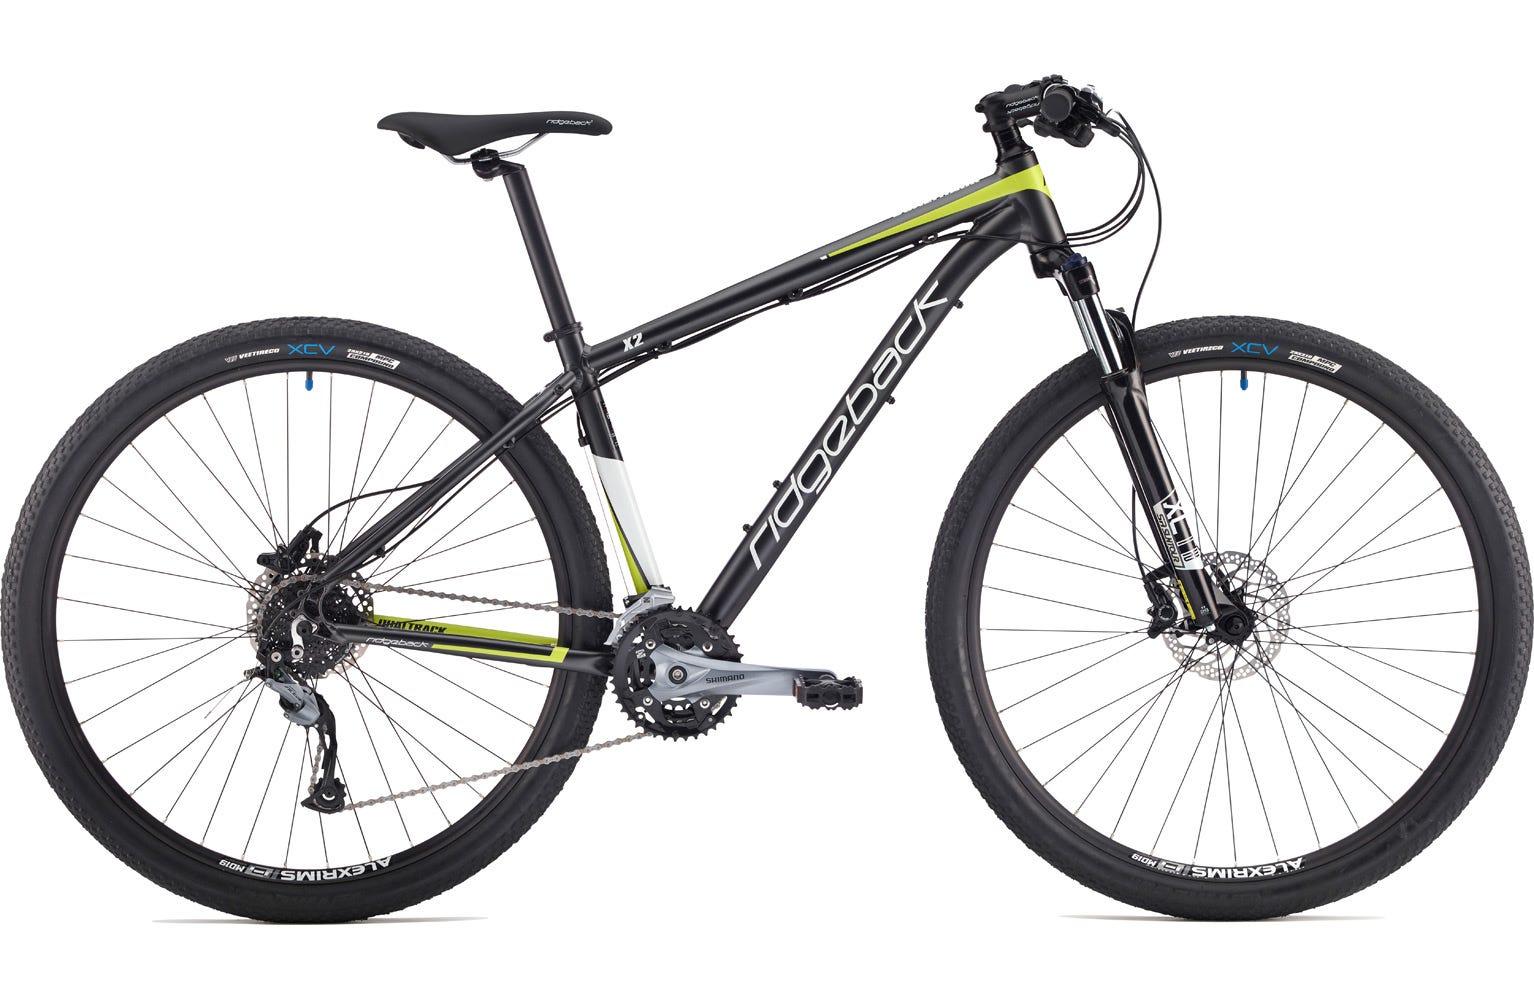 Ridgeback X2 15 inch bike Ex Display